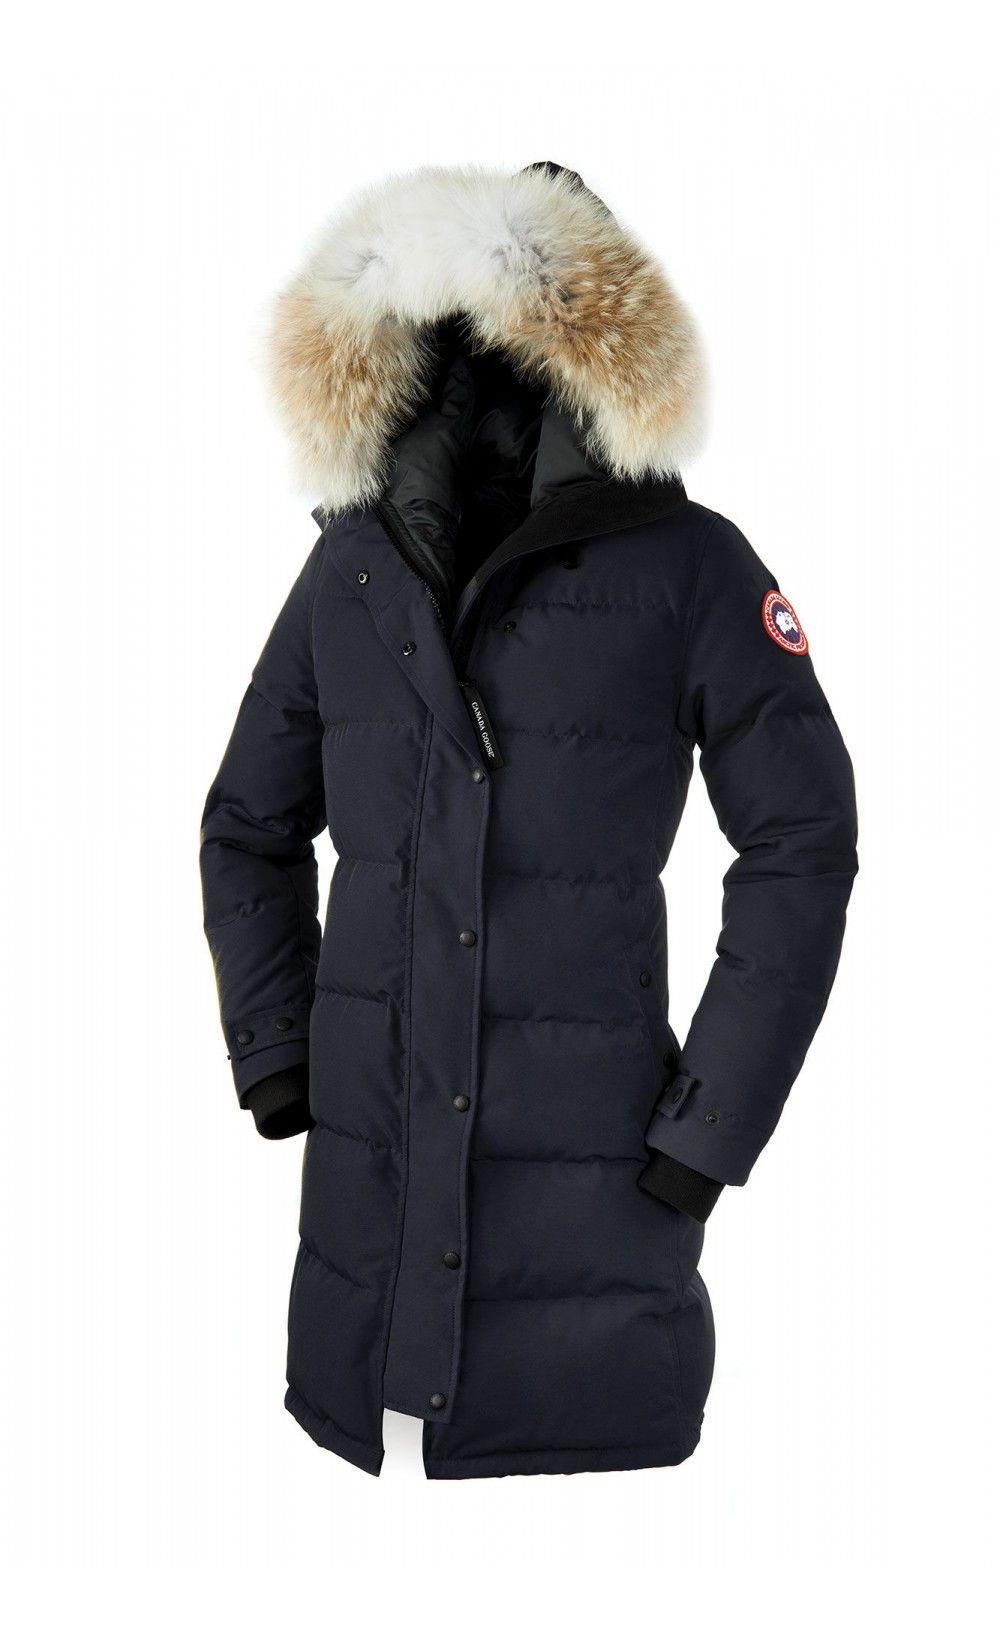 c761c5a76ba8 Canada Goose Shelburne Parka Navy Women - Canada Goose  canadagoose  women   parka  jacket  winter  newyear  gifts  fashion  lifestyle